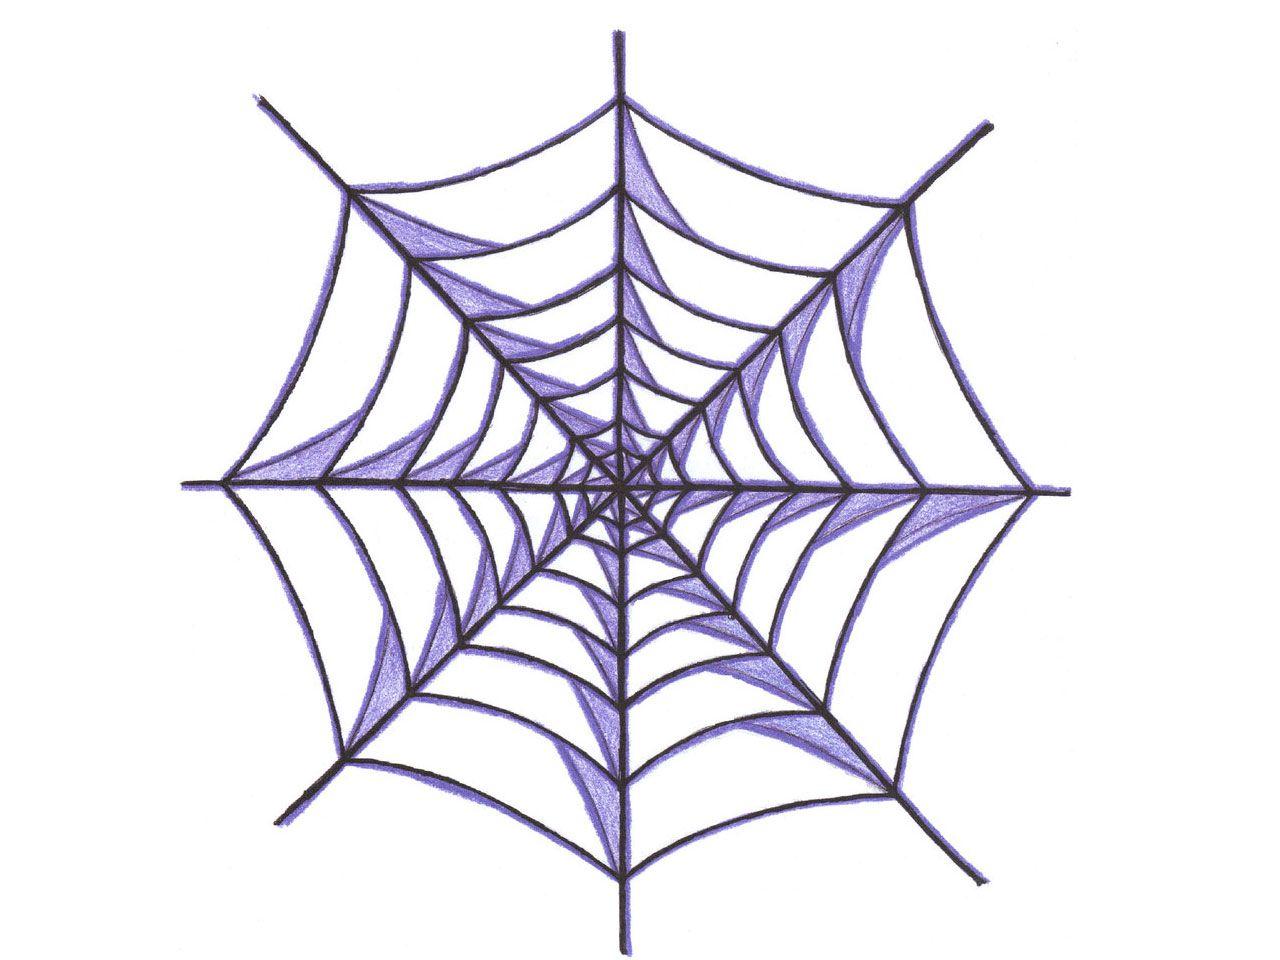 Billede fra http://www.tattoo-wallpapers.com/user-content/uploads/wall/o/92/spider_web_of_straight_edges_tattoo_idea.jpg.